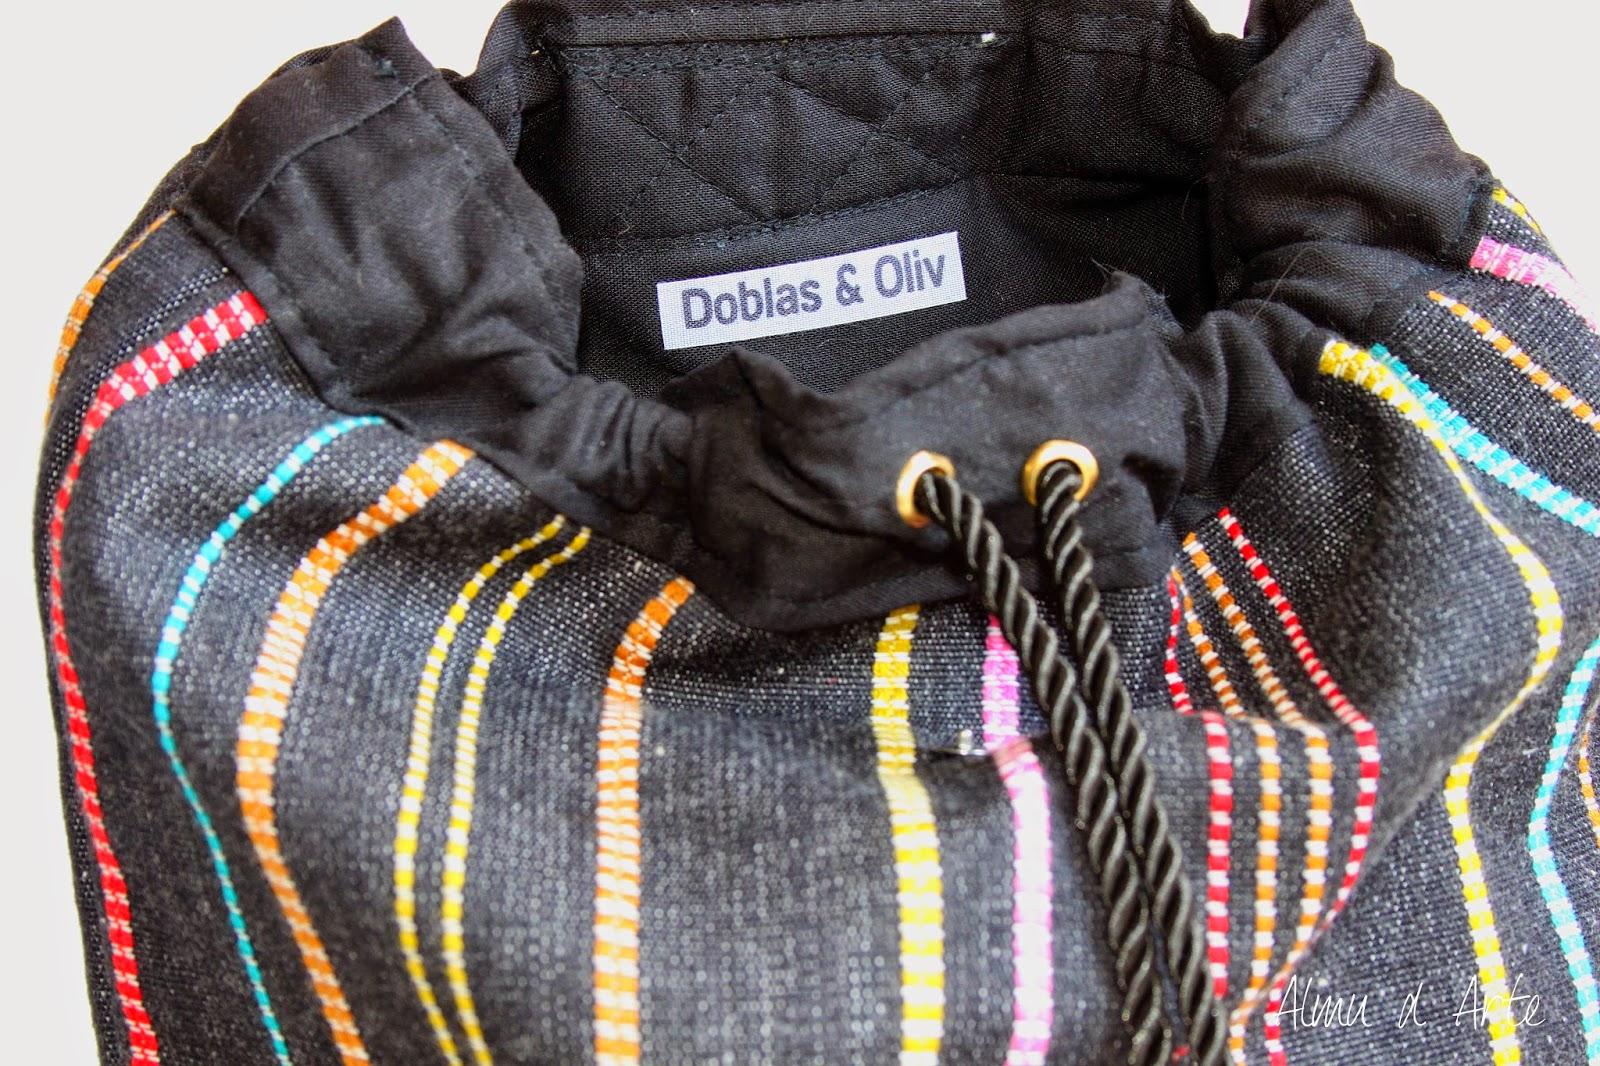 Mochila étnica artesanal con interior forrado